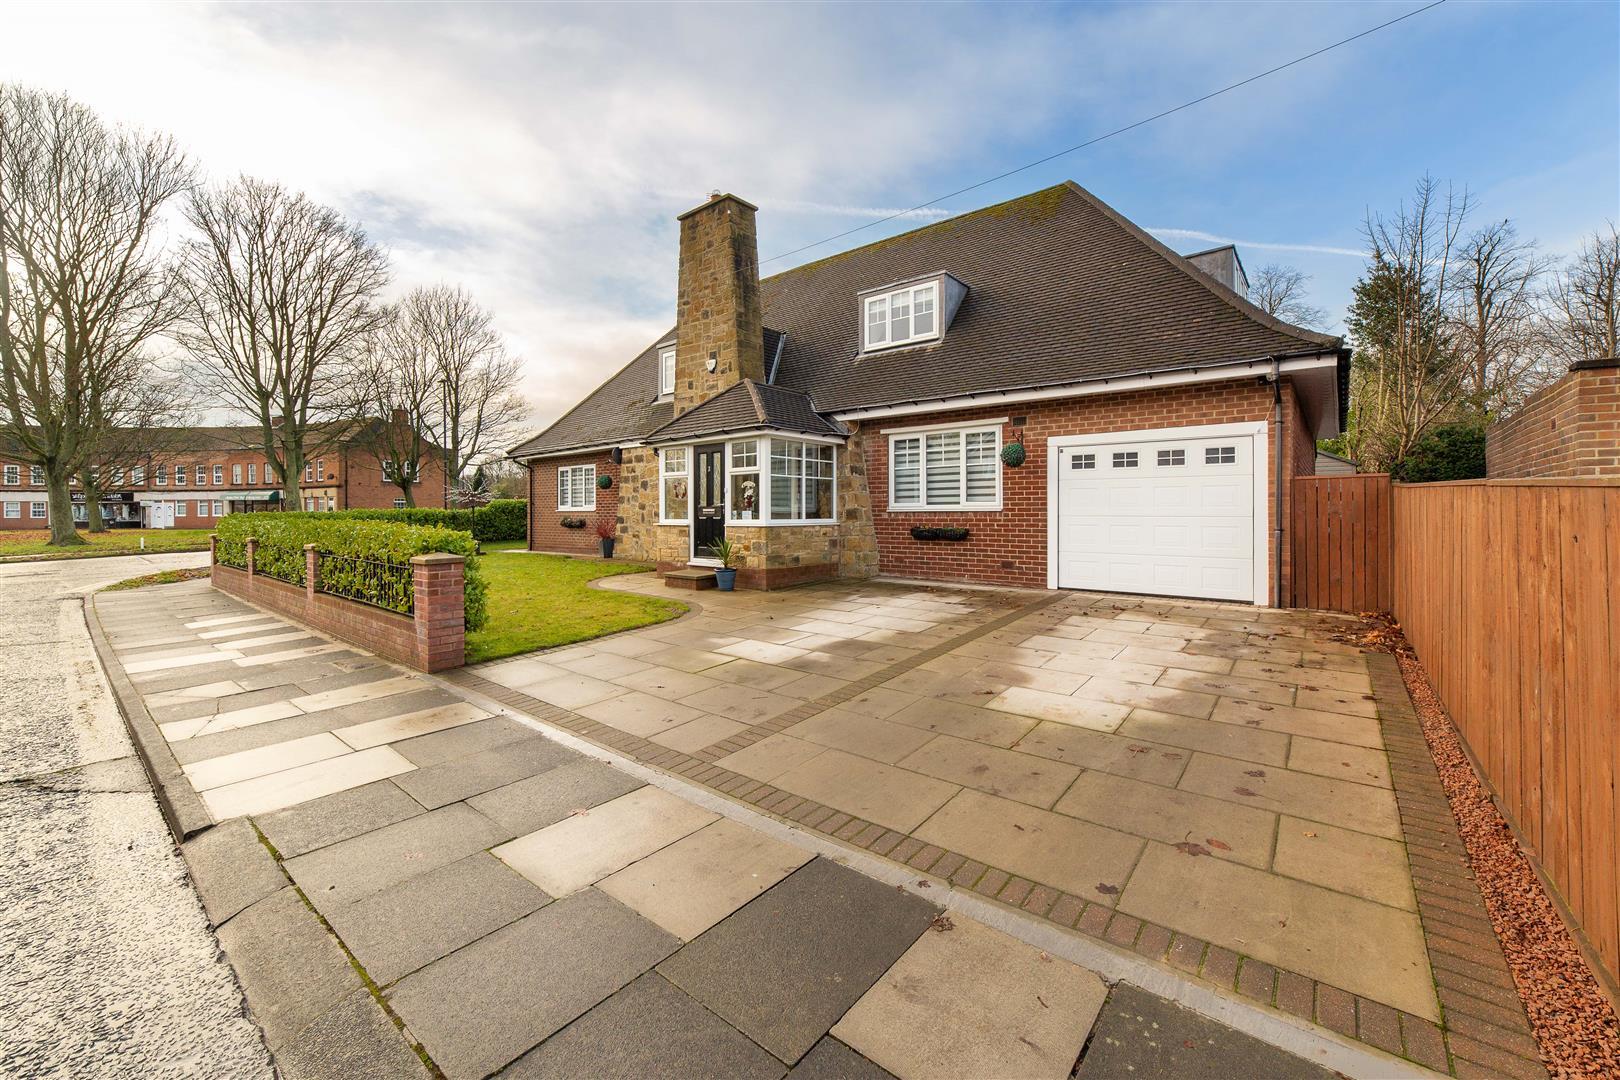 4 bed detached house for sale in Easedale Avenue, Melton Park  - Property Image 1